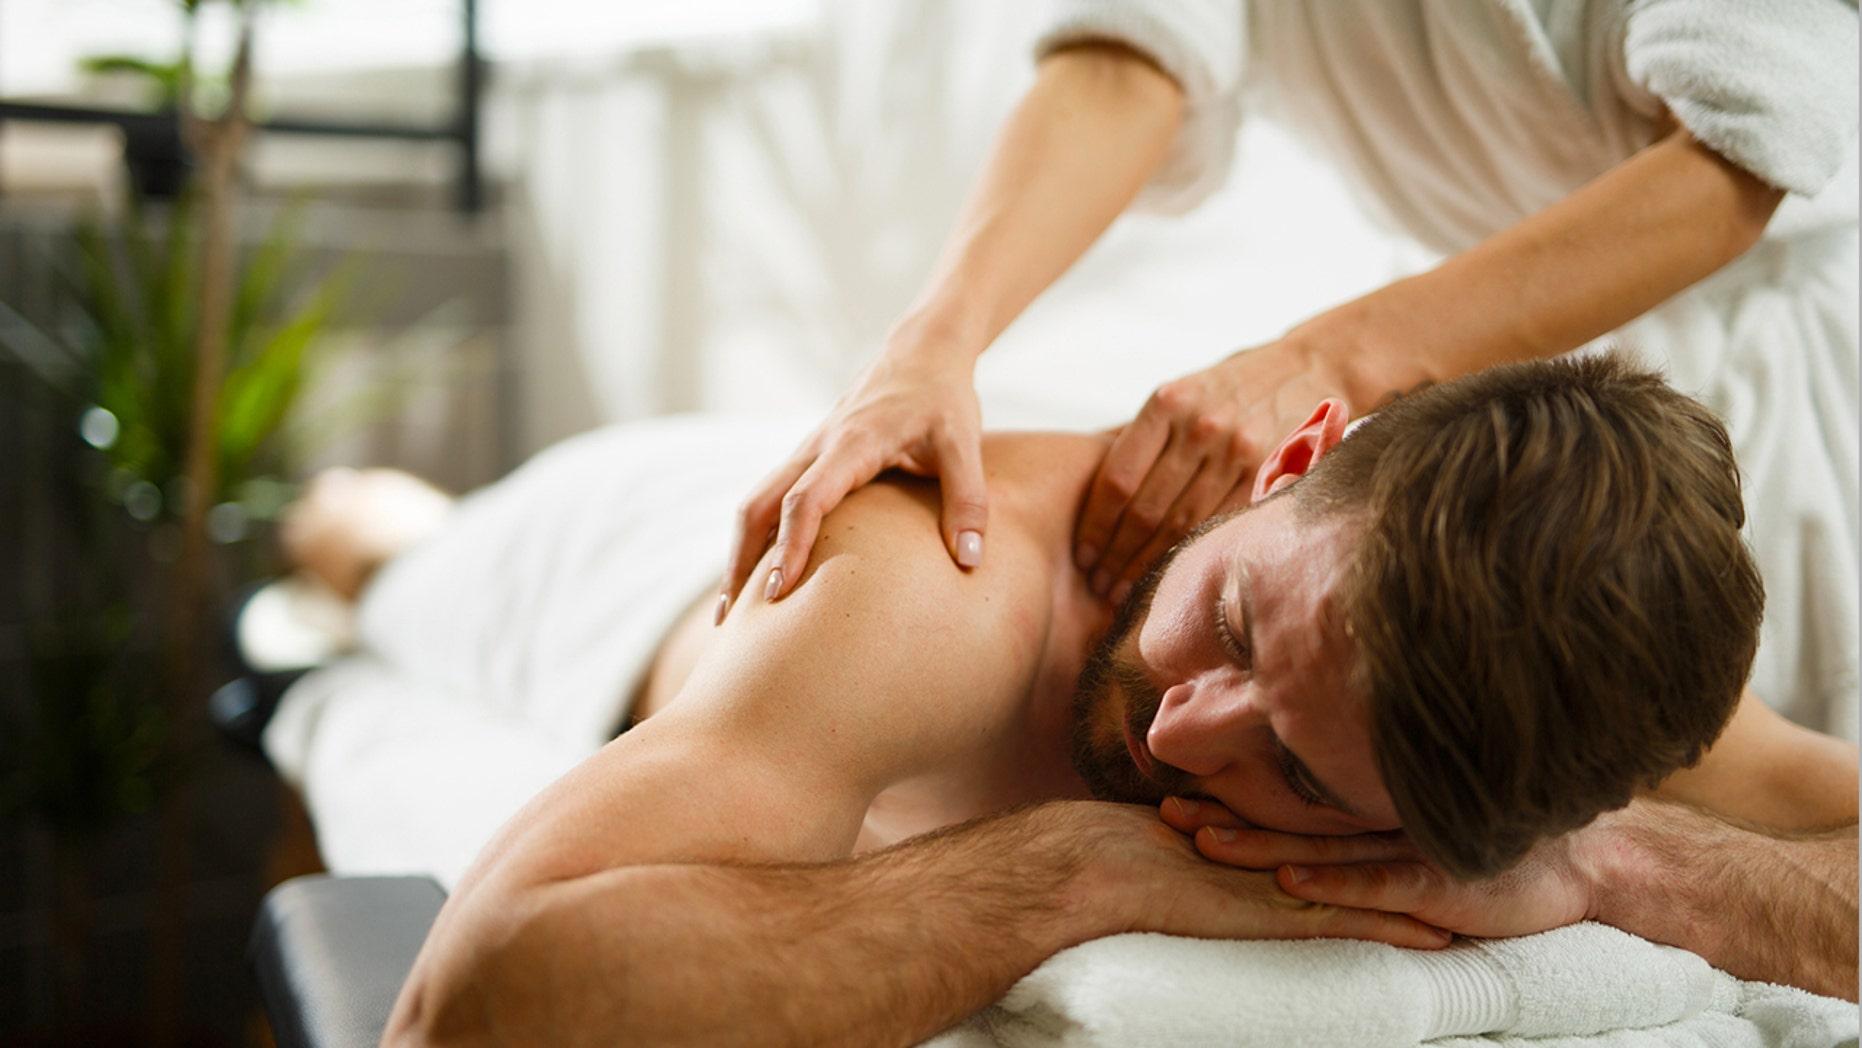 musta lesbo masage hardcore lesbo pillua hionta